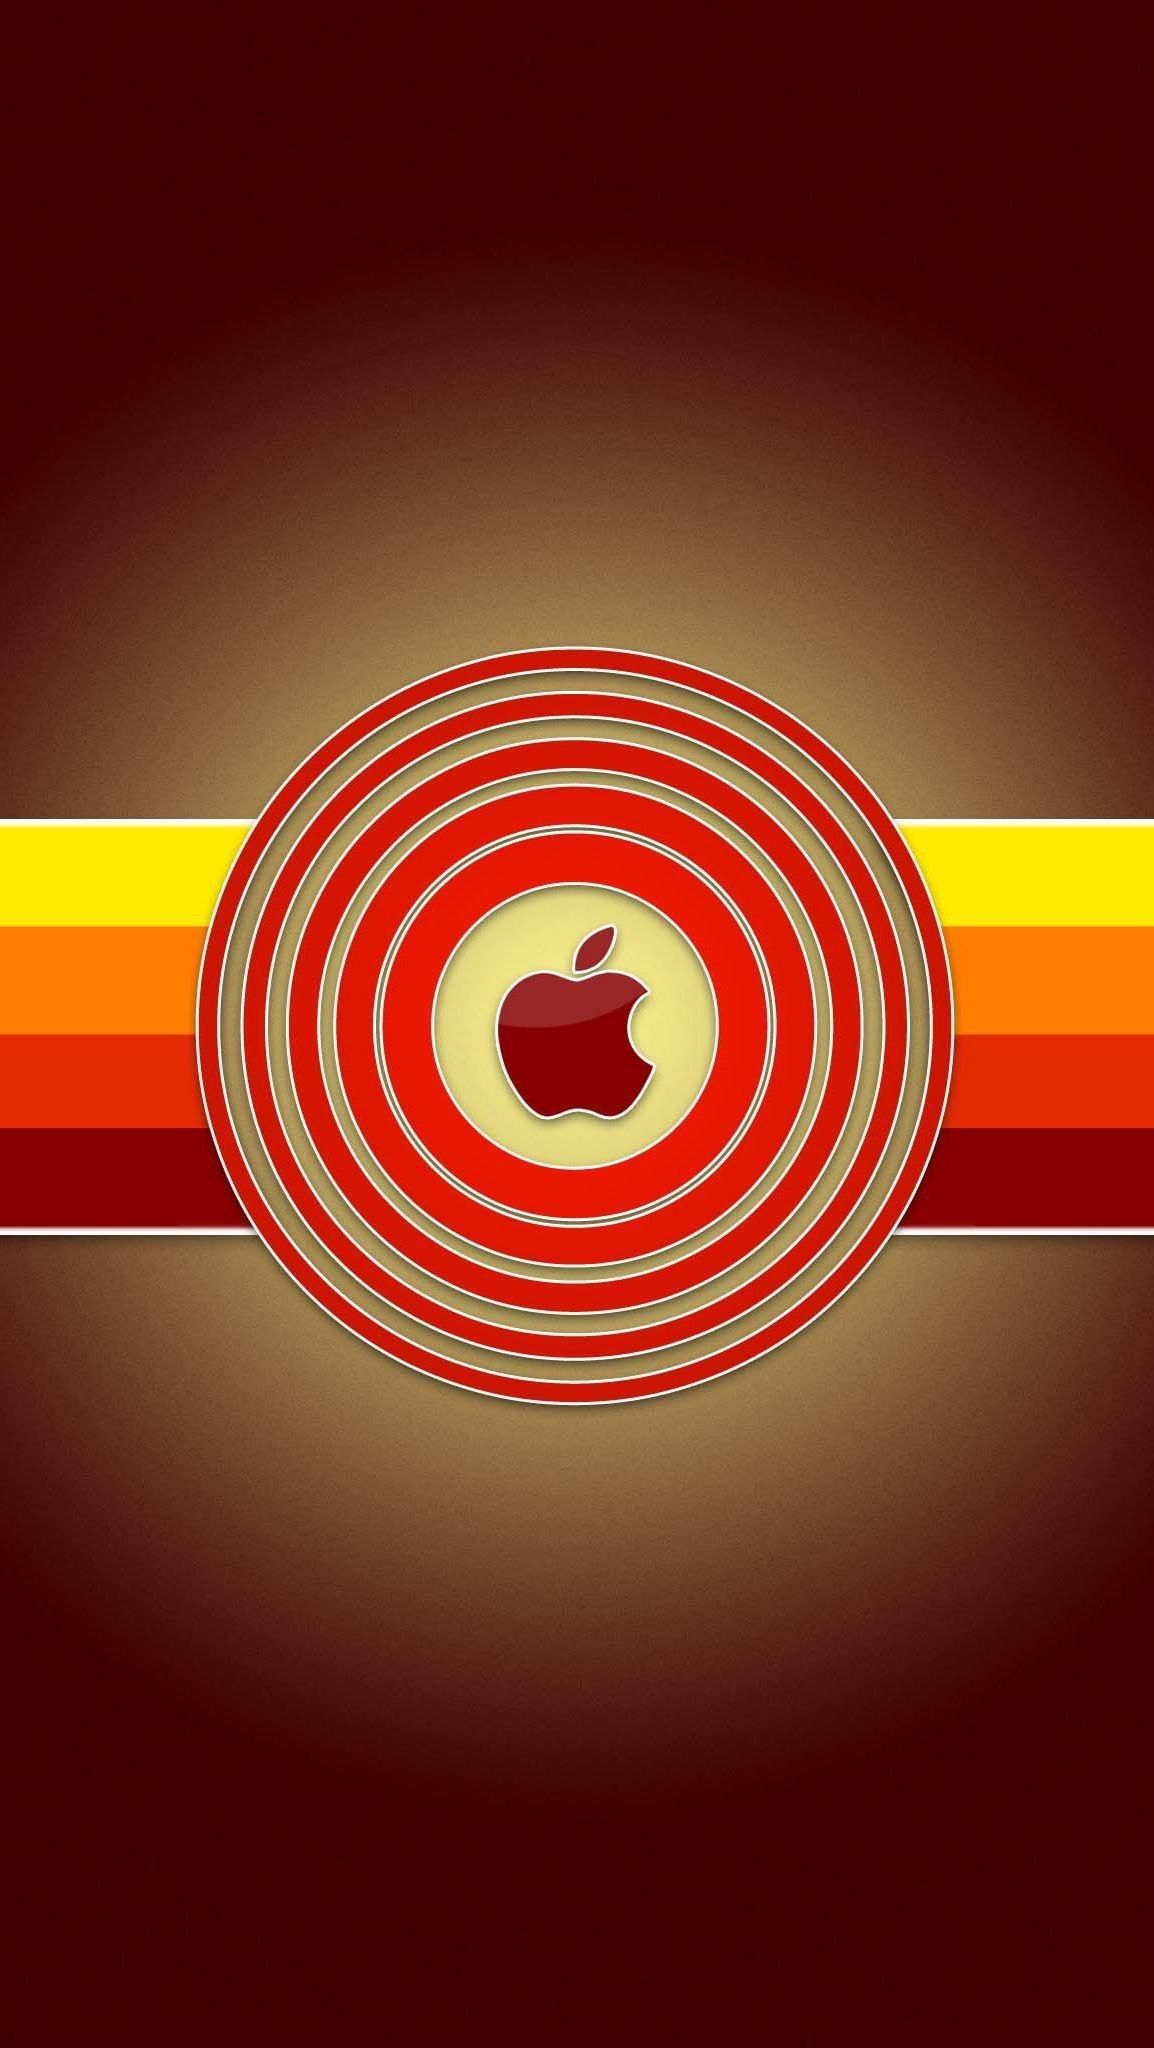 Pin by Małgorzata Wojtowicz on Apple in 2020 Apple logo